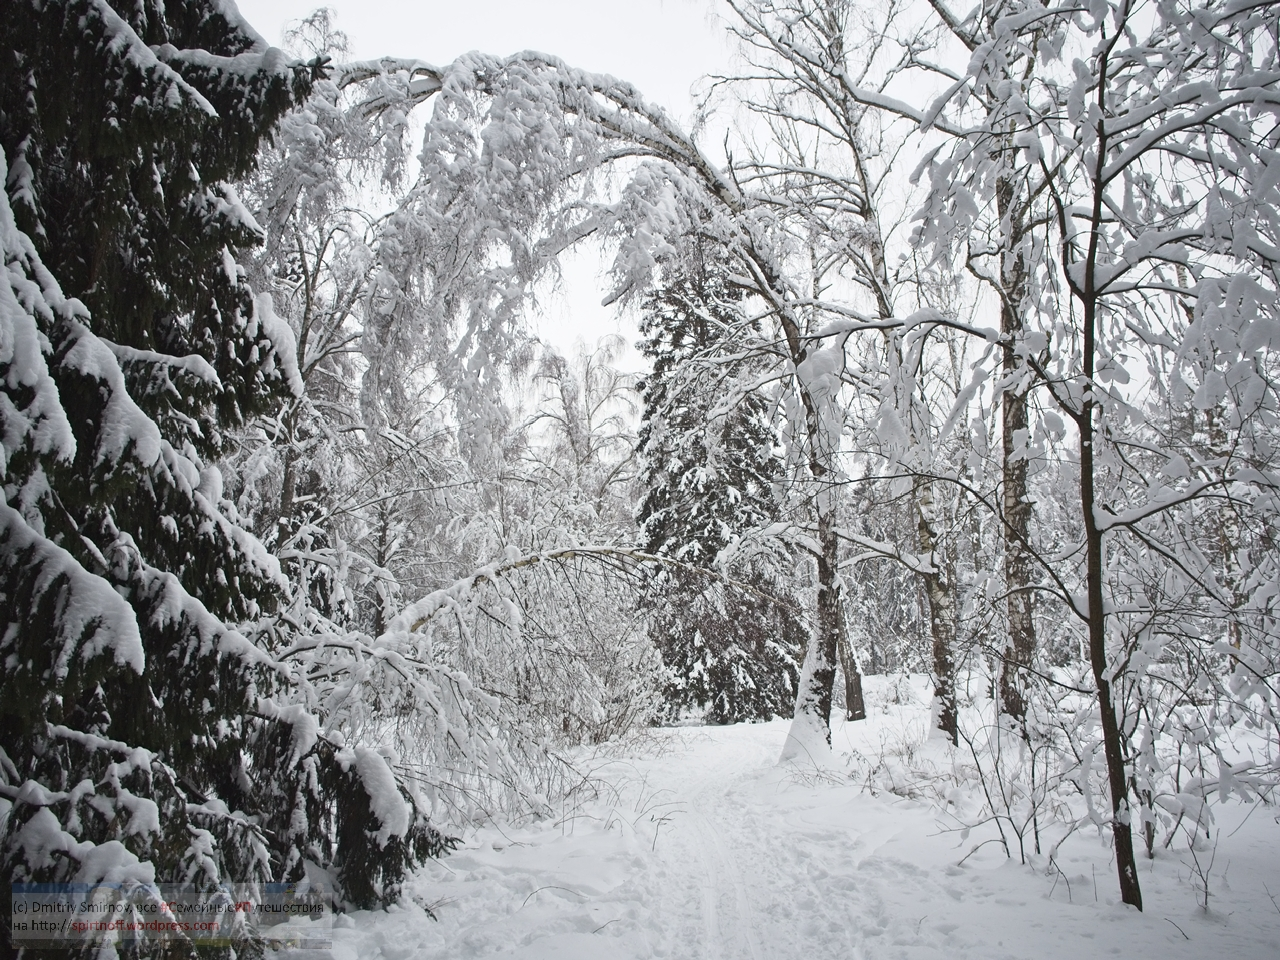 SMI01029-Blog-38 Просто фото  Зима в Лосином острове